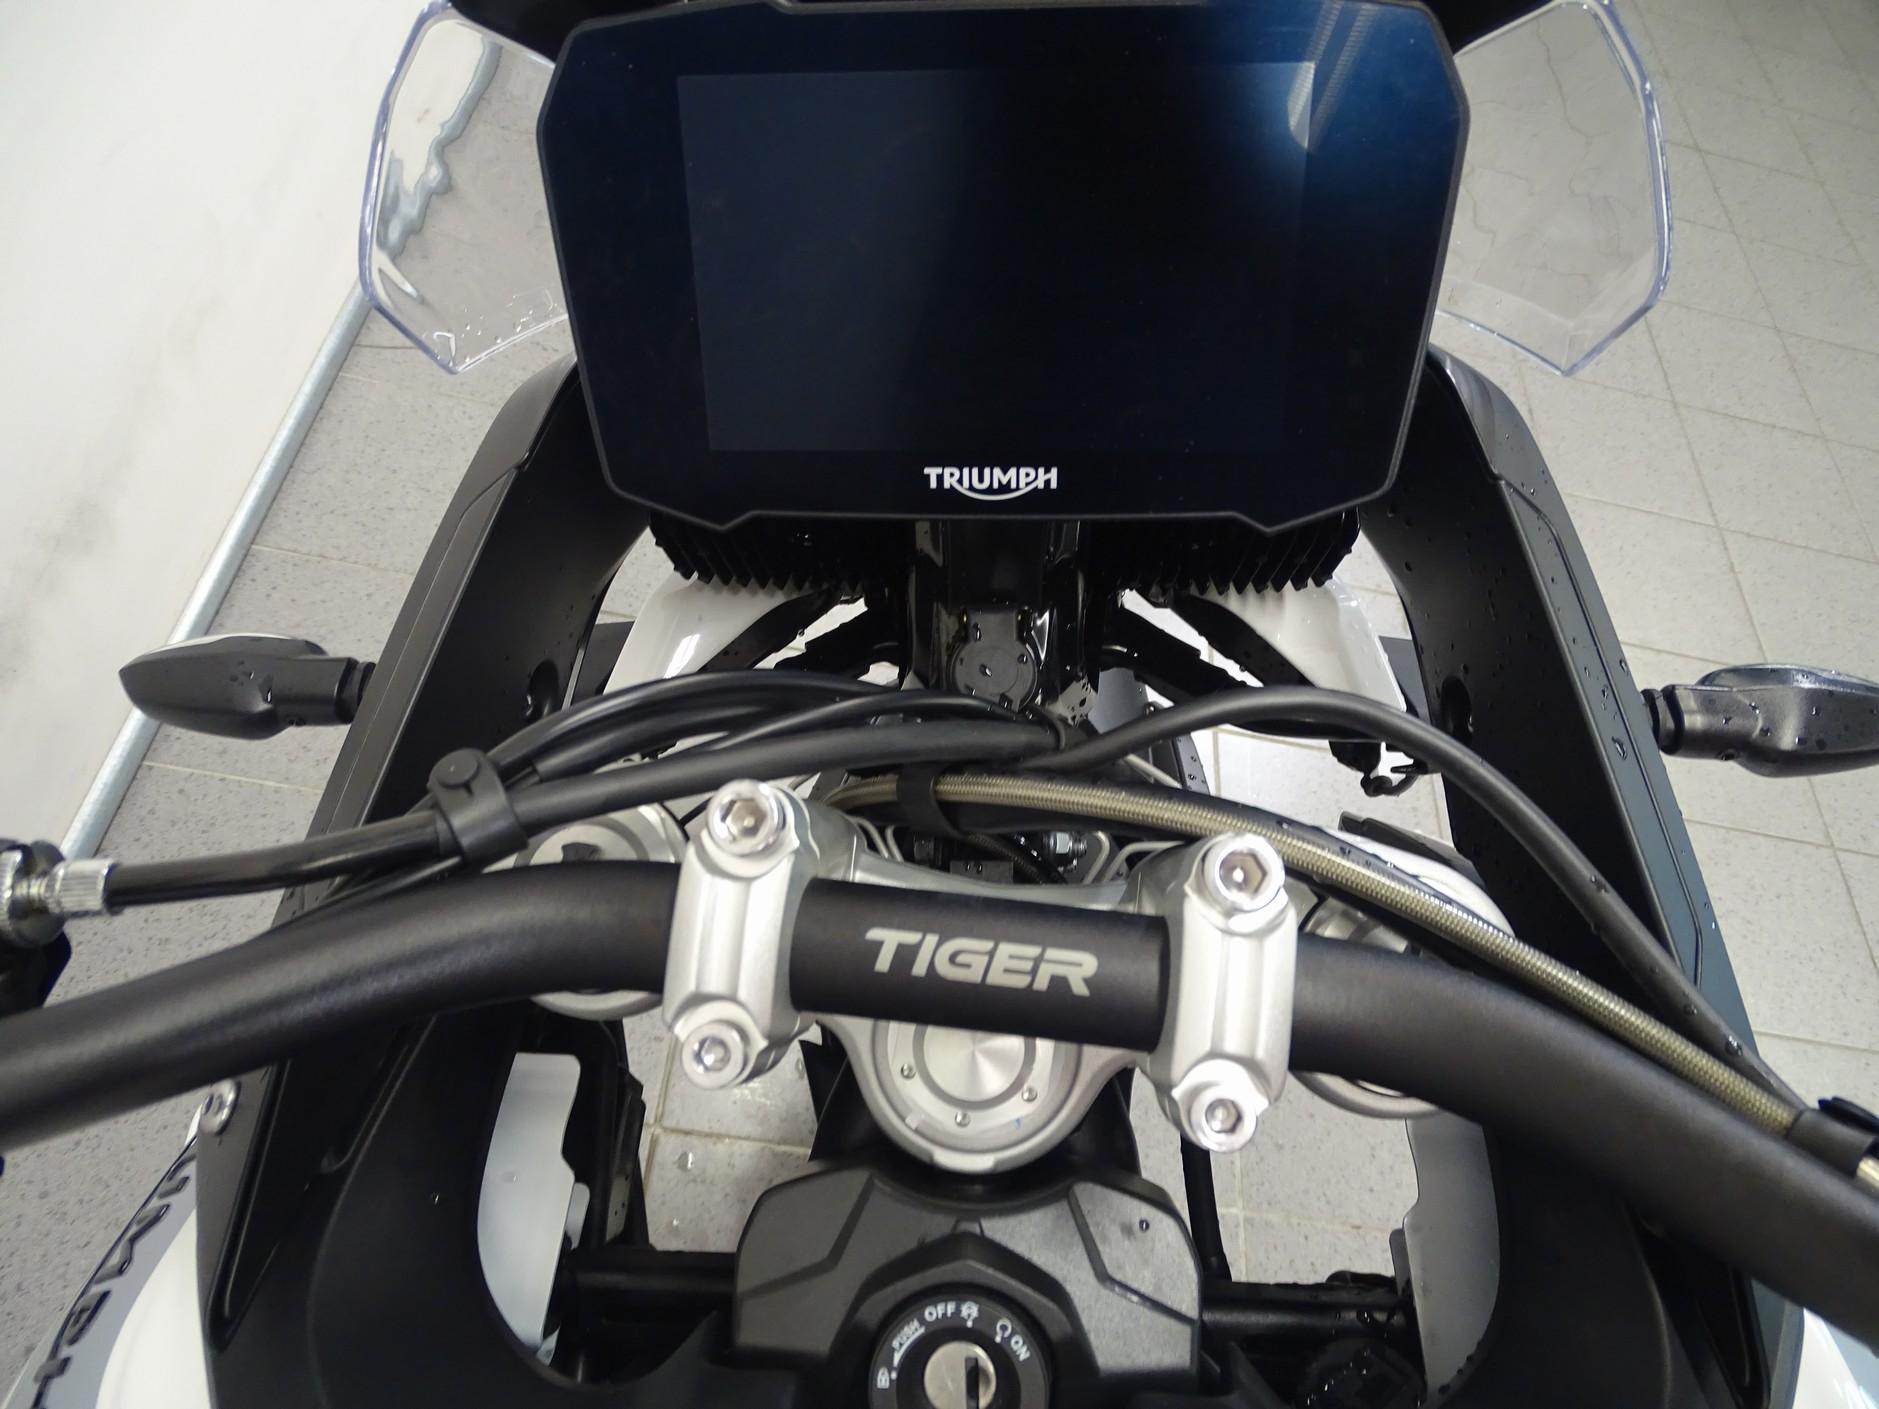 TRIUMPH - TIGER 900 GT PRO